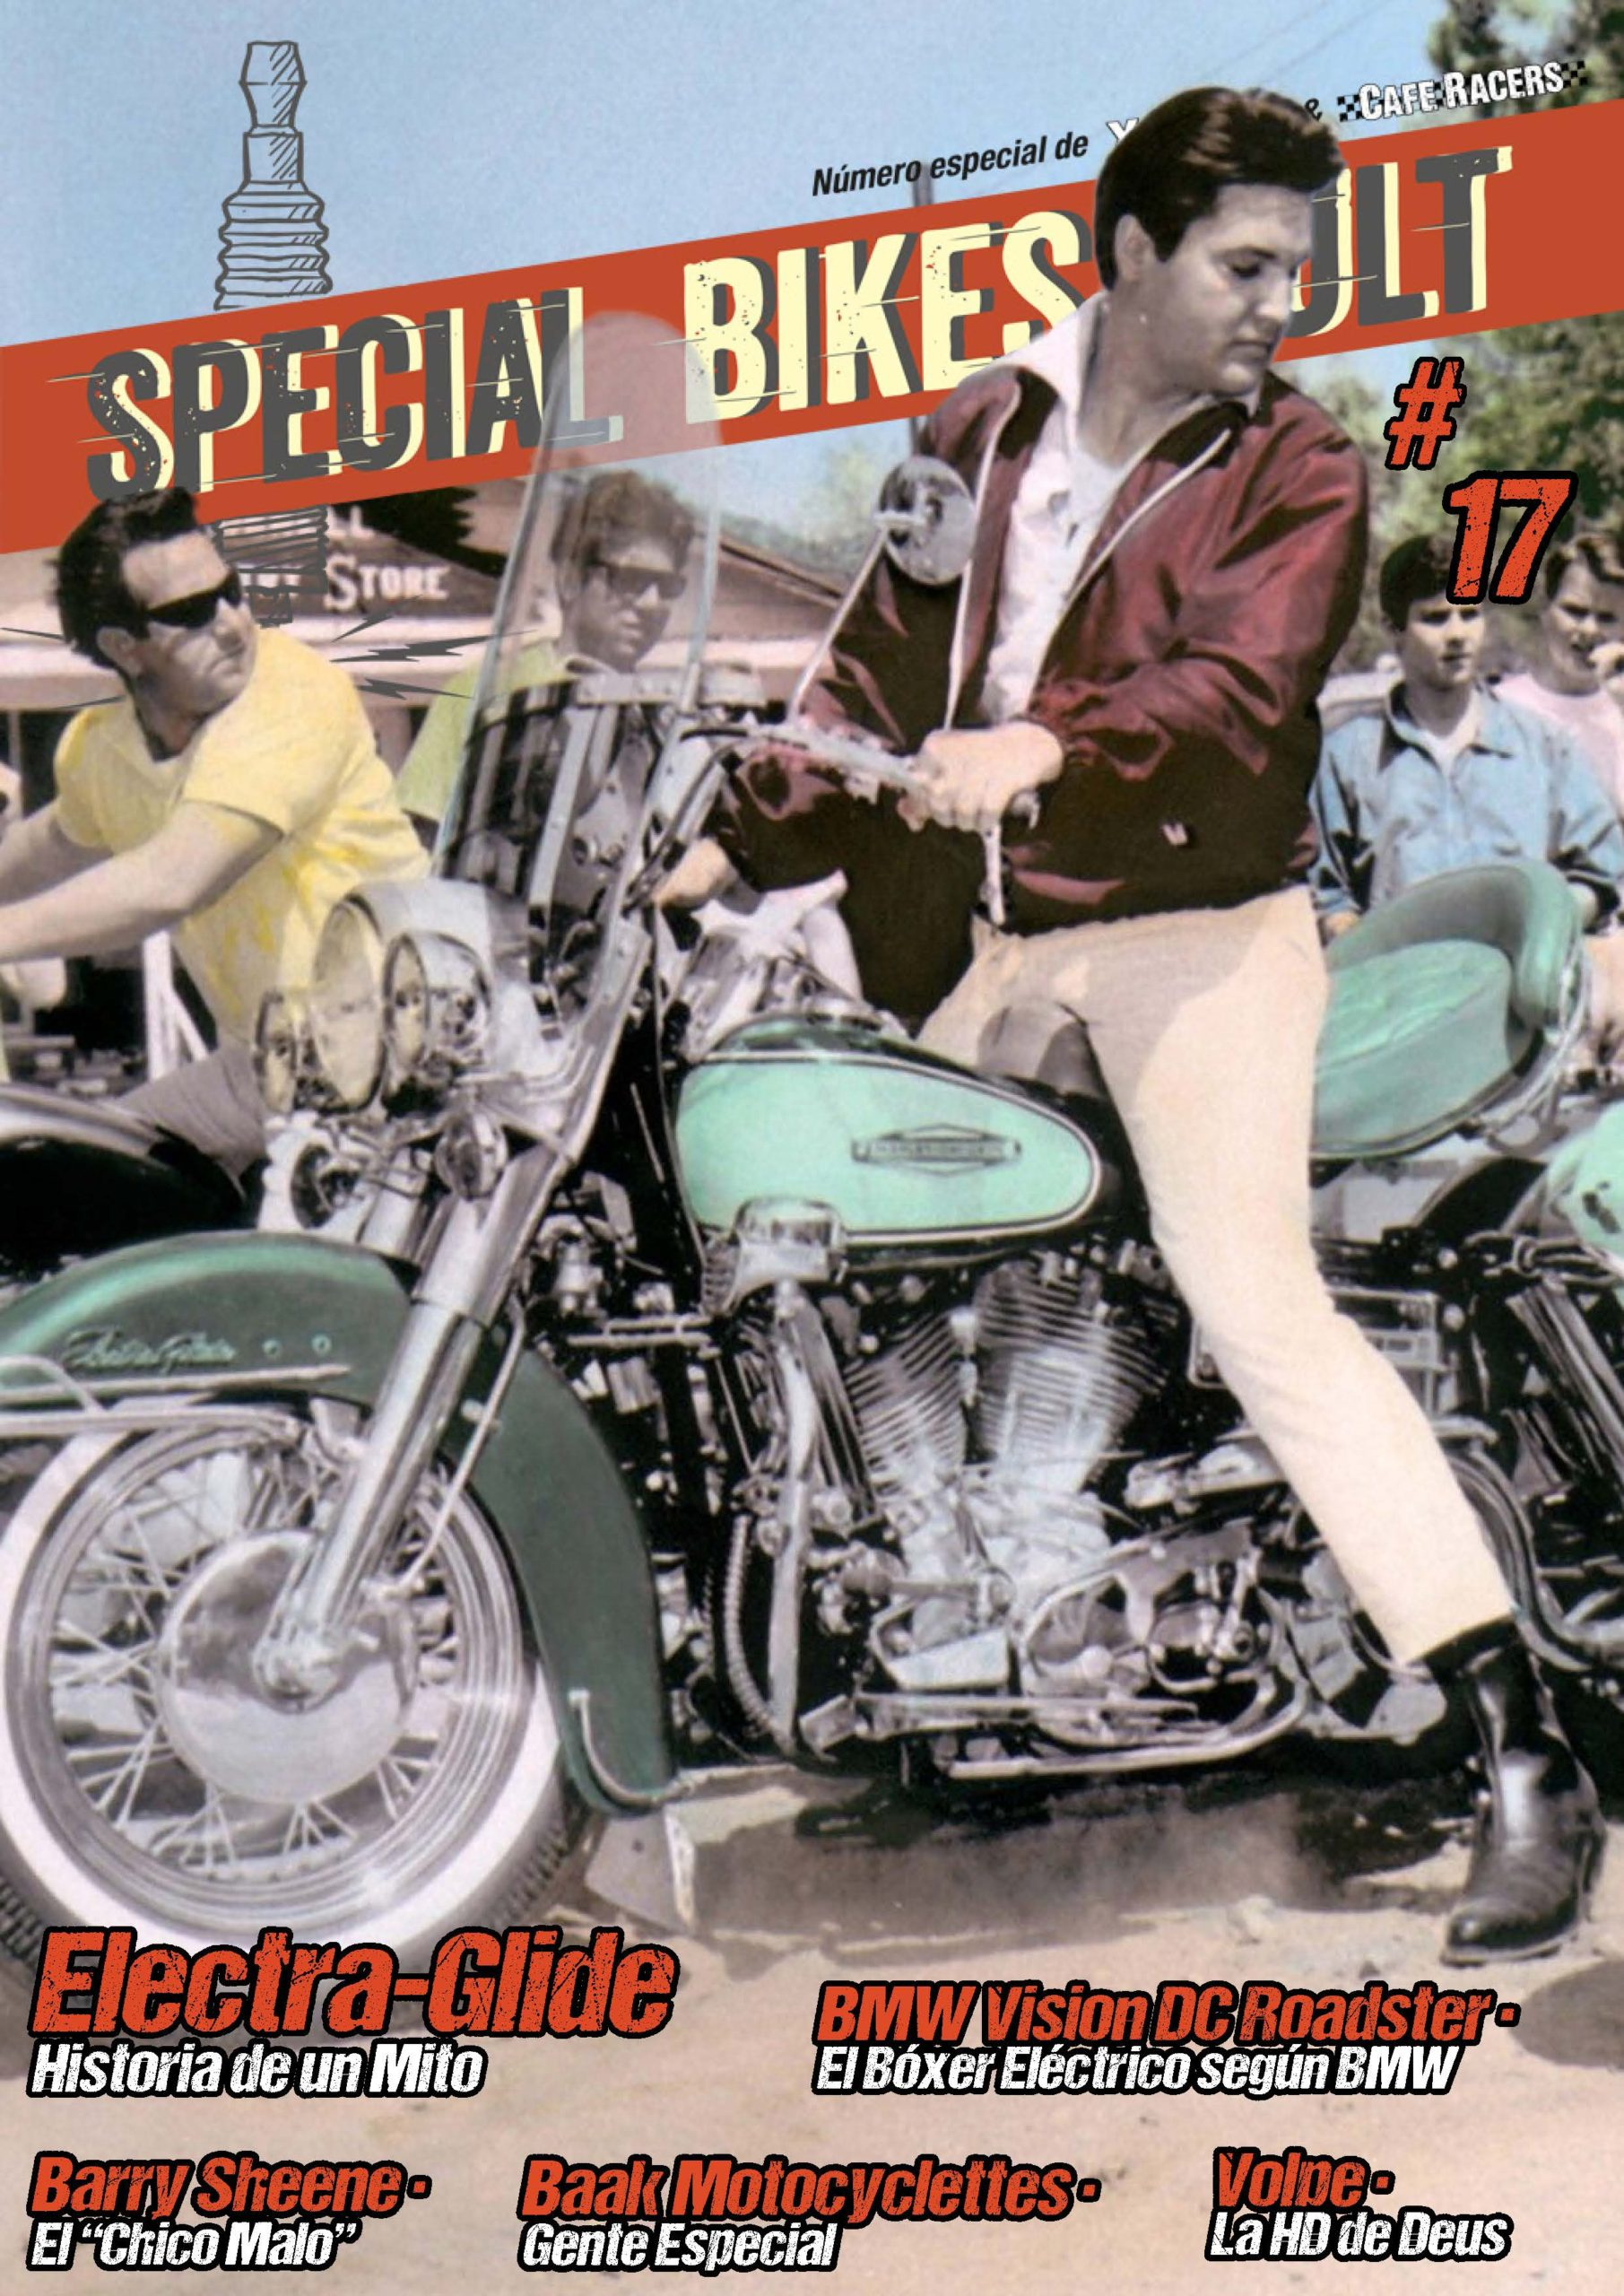 Special Bikes Cult #17